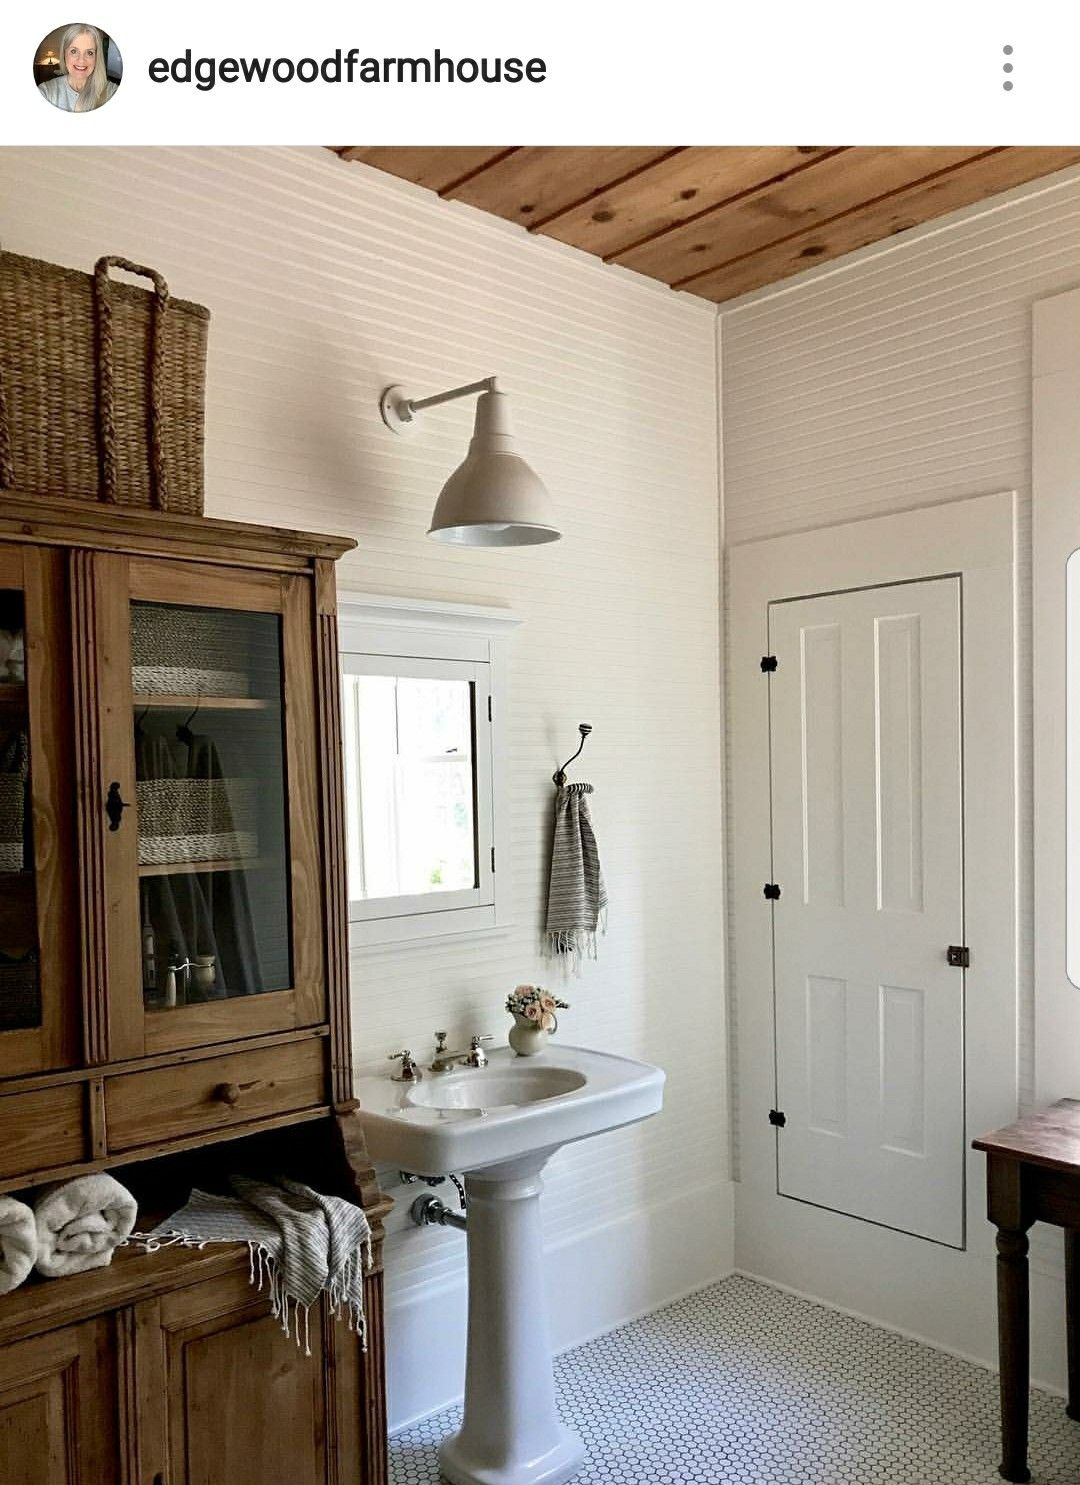 Love this built in linen closet and hardware | Bedroom Bathroom Reno ...